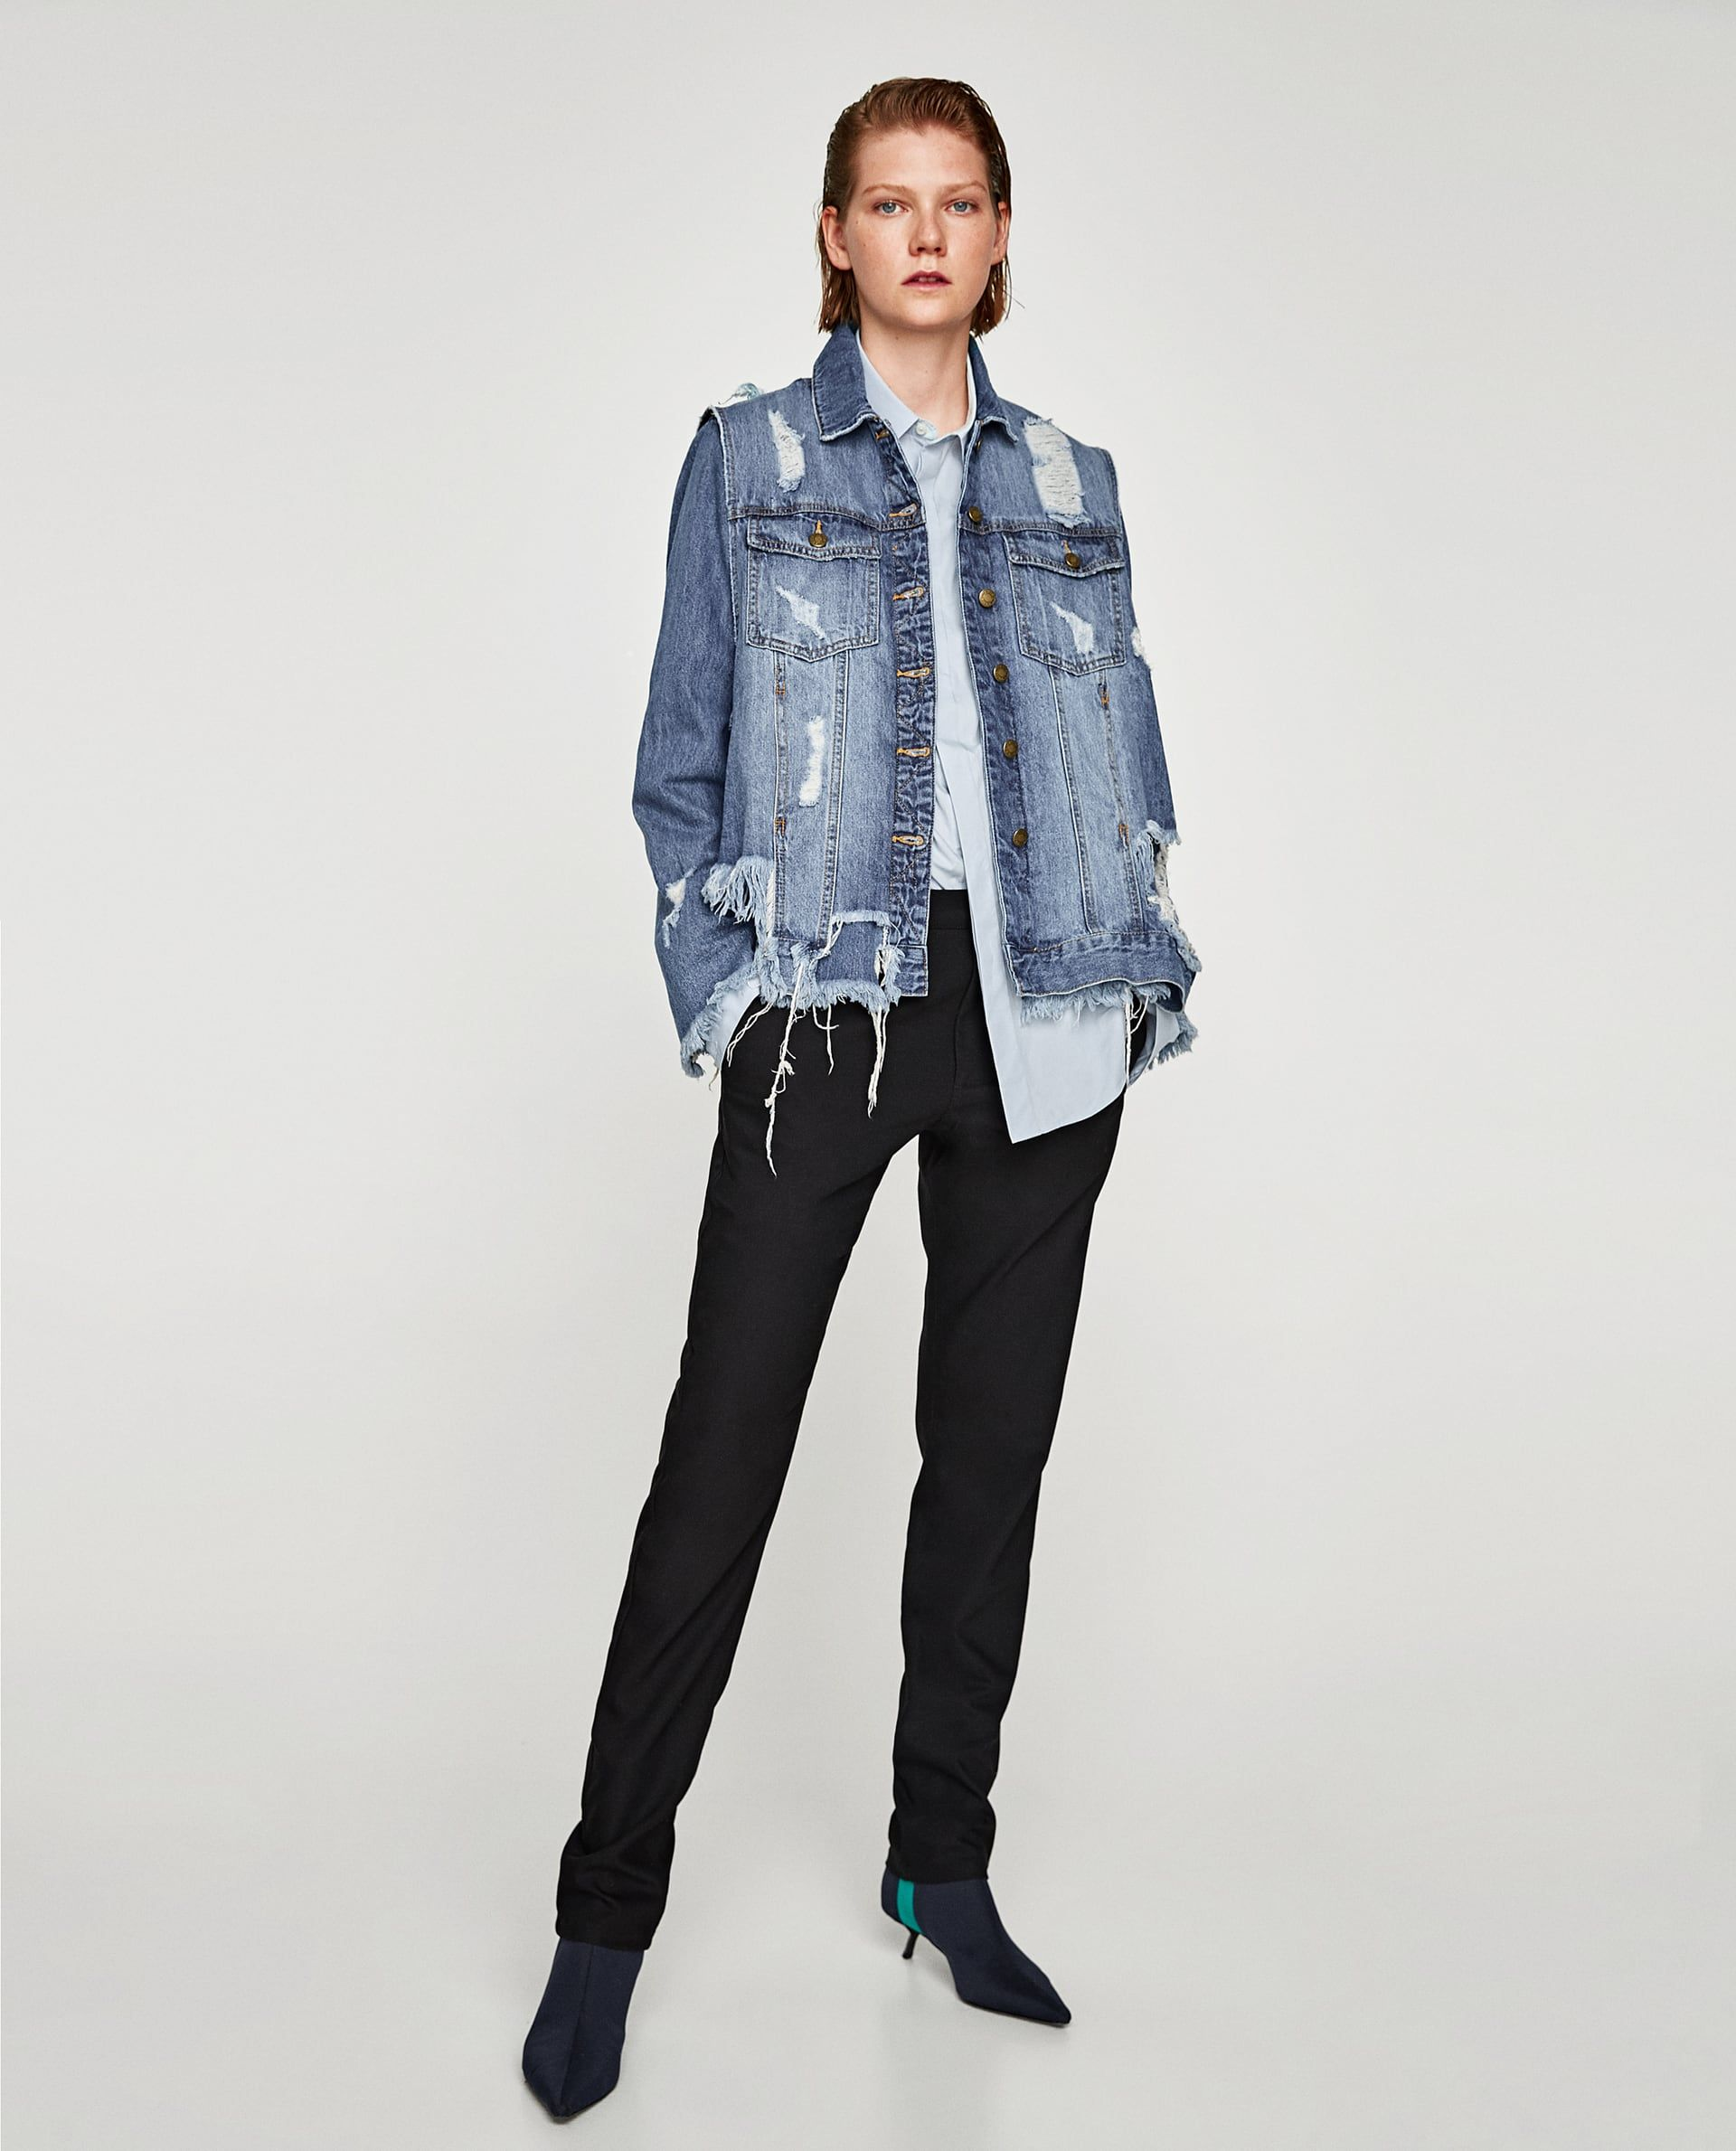 a7a6835e Image 1 of RIPPED DENIM WAISTCOAT JACKET from Zara Zara Denim Jacket, Denim  Waistcoat,